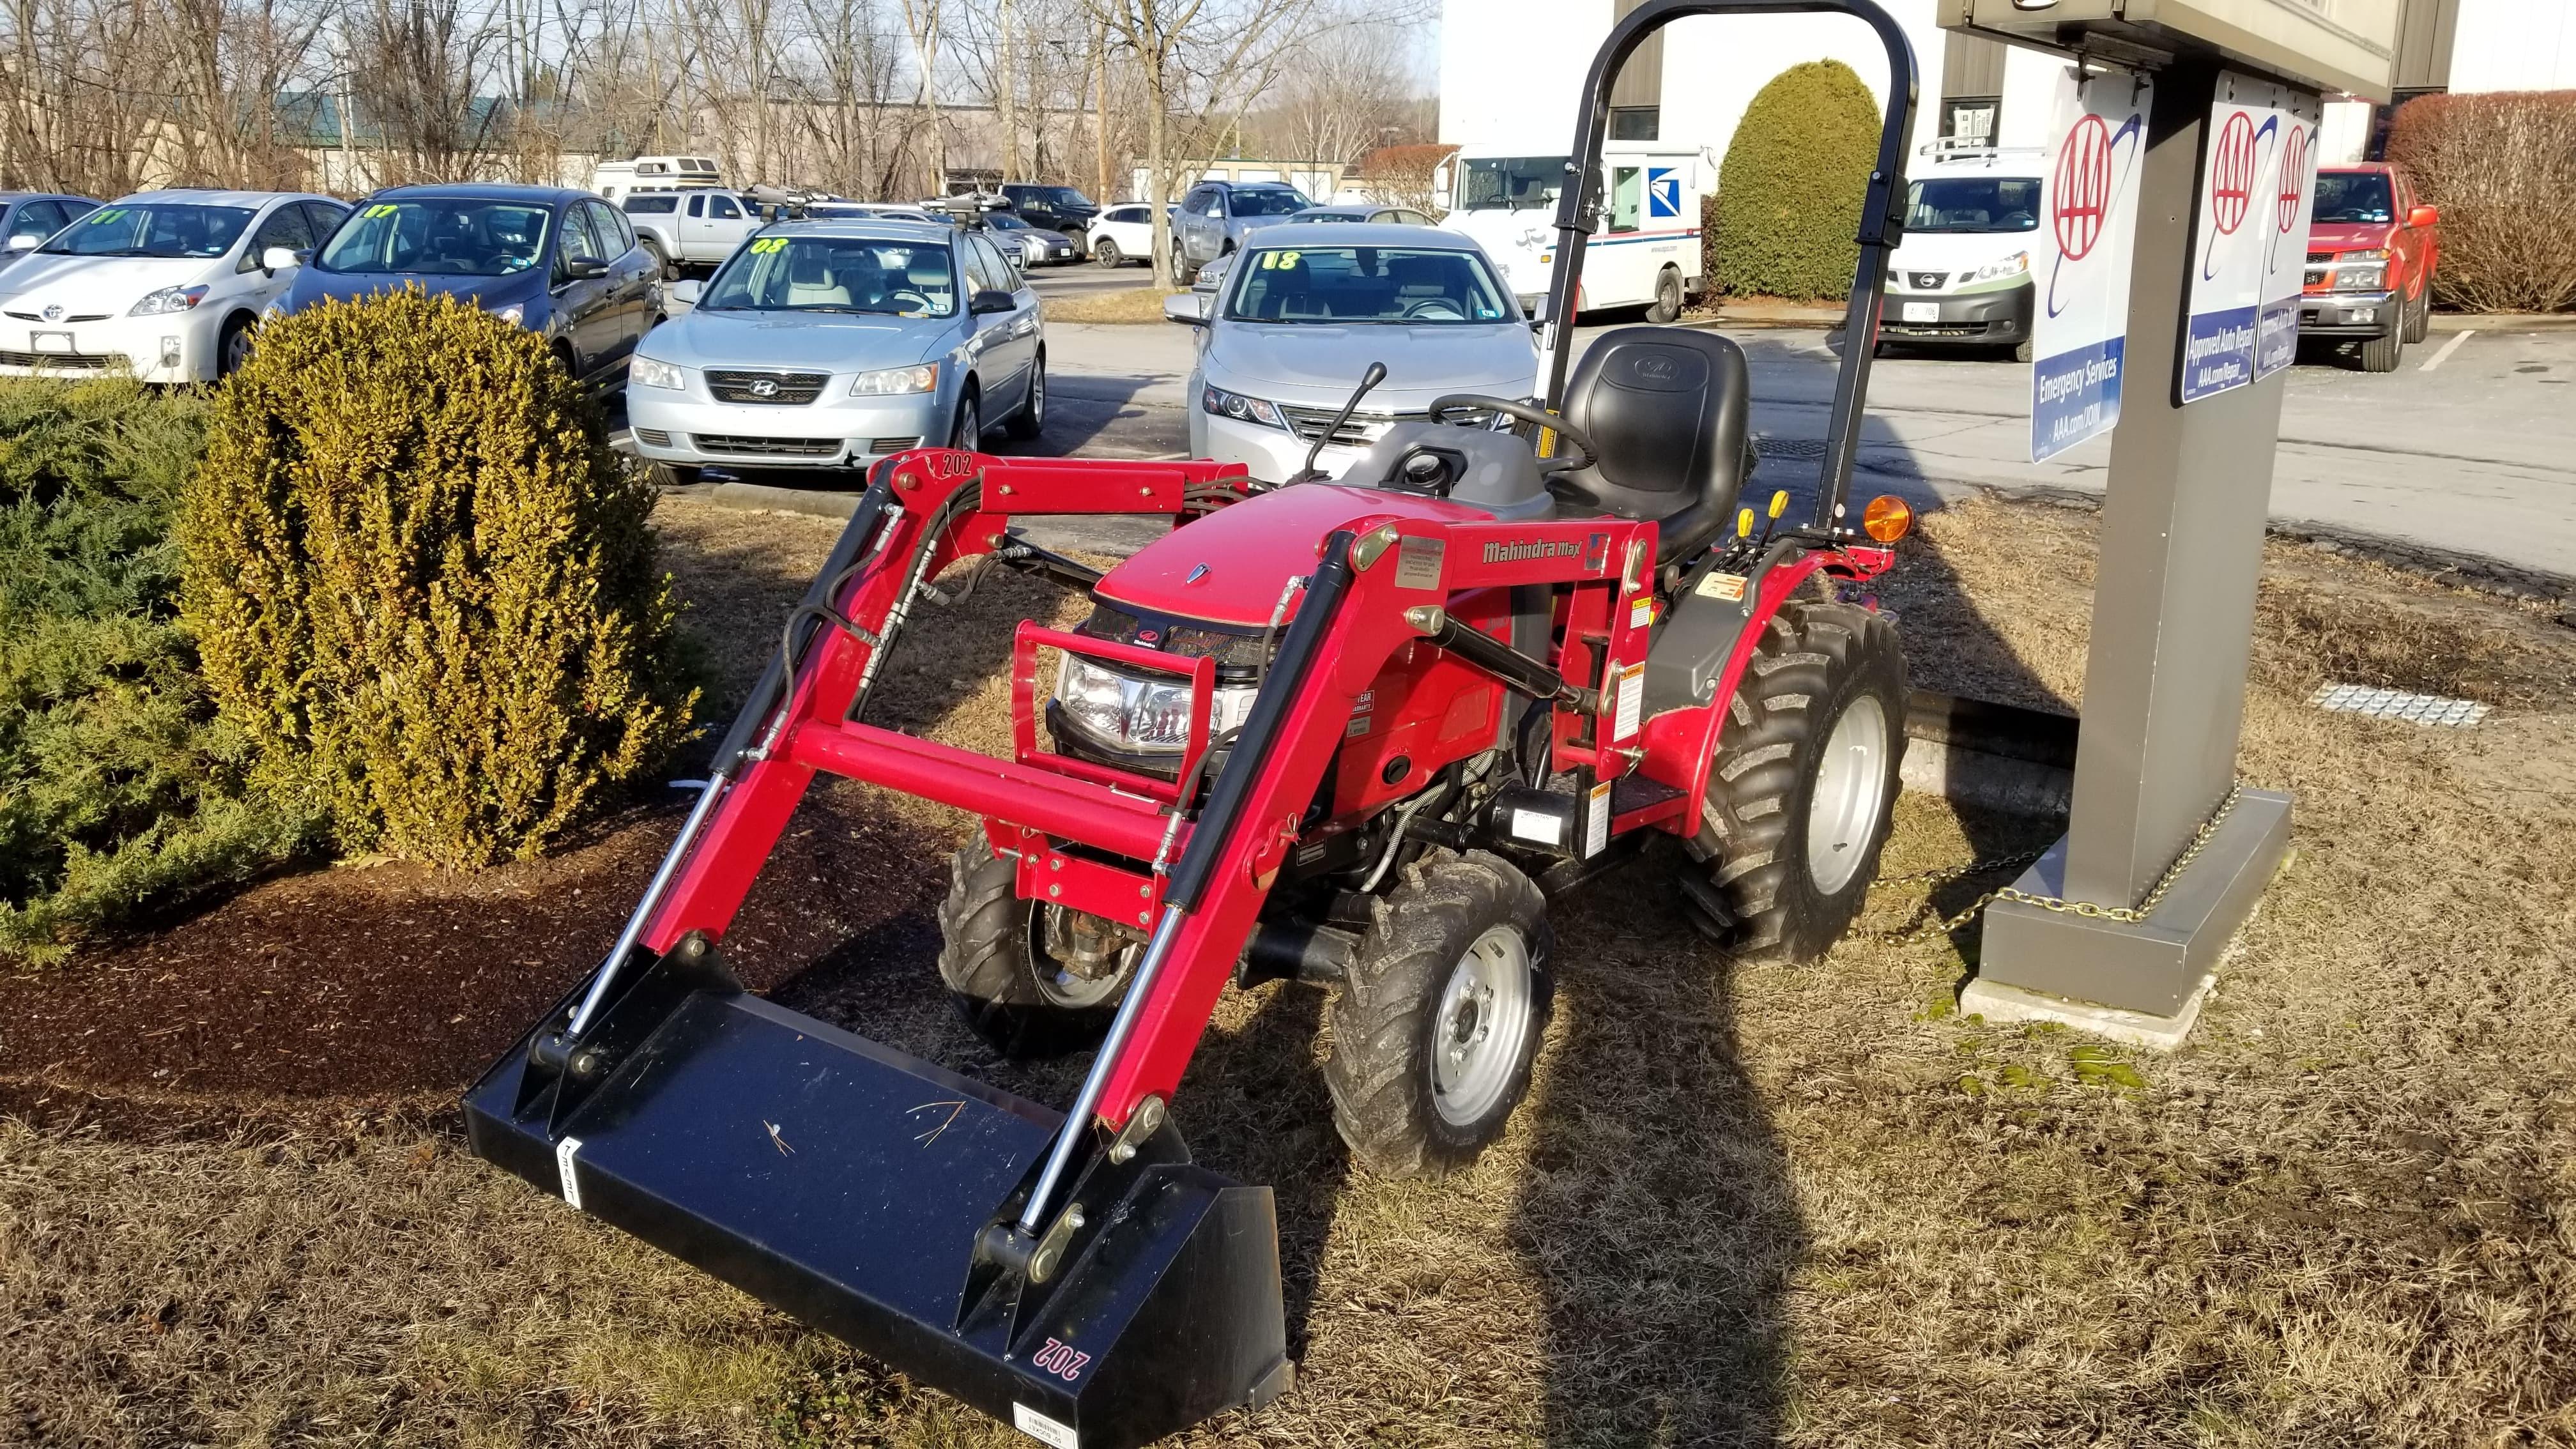 2013 Mahindra Max 25 HST 4wd Tractor